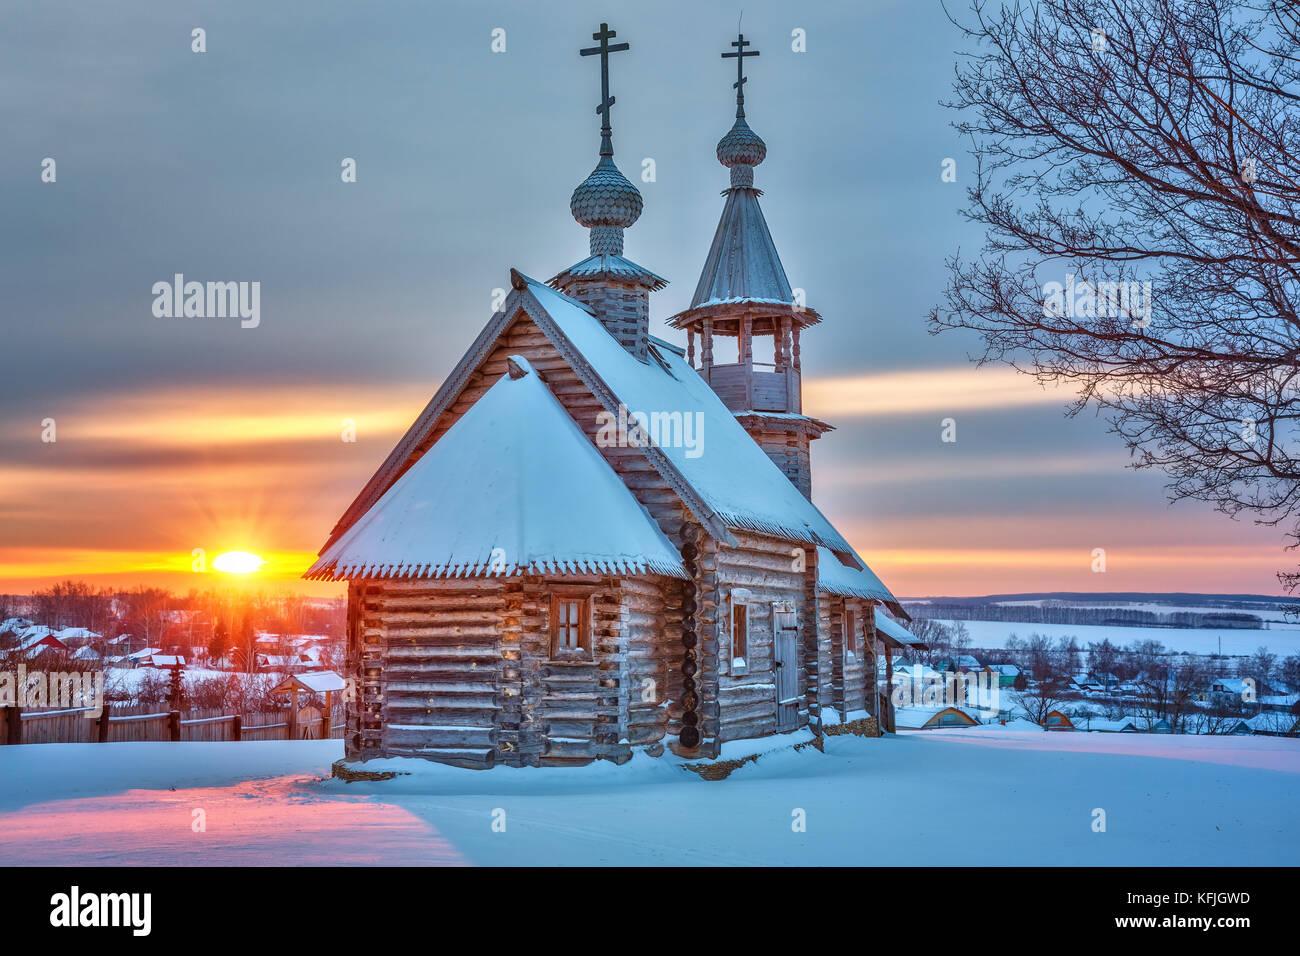 Pequeña iglesia rusa al atardecer en invierno Imagen De Stock